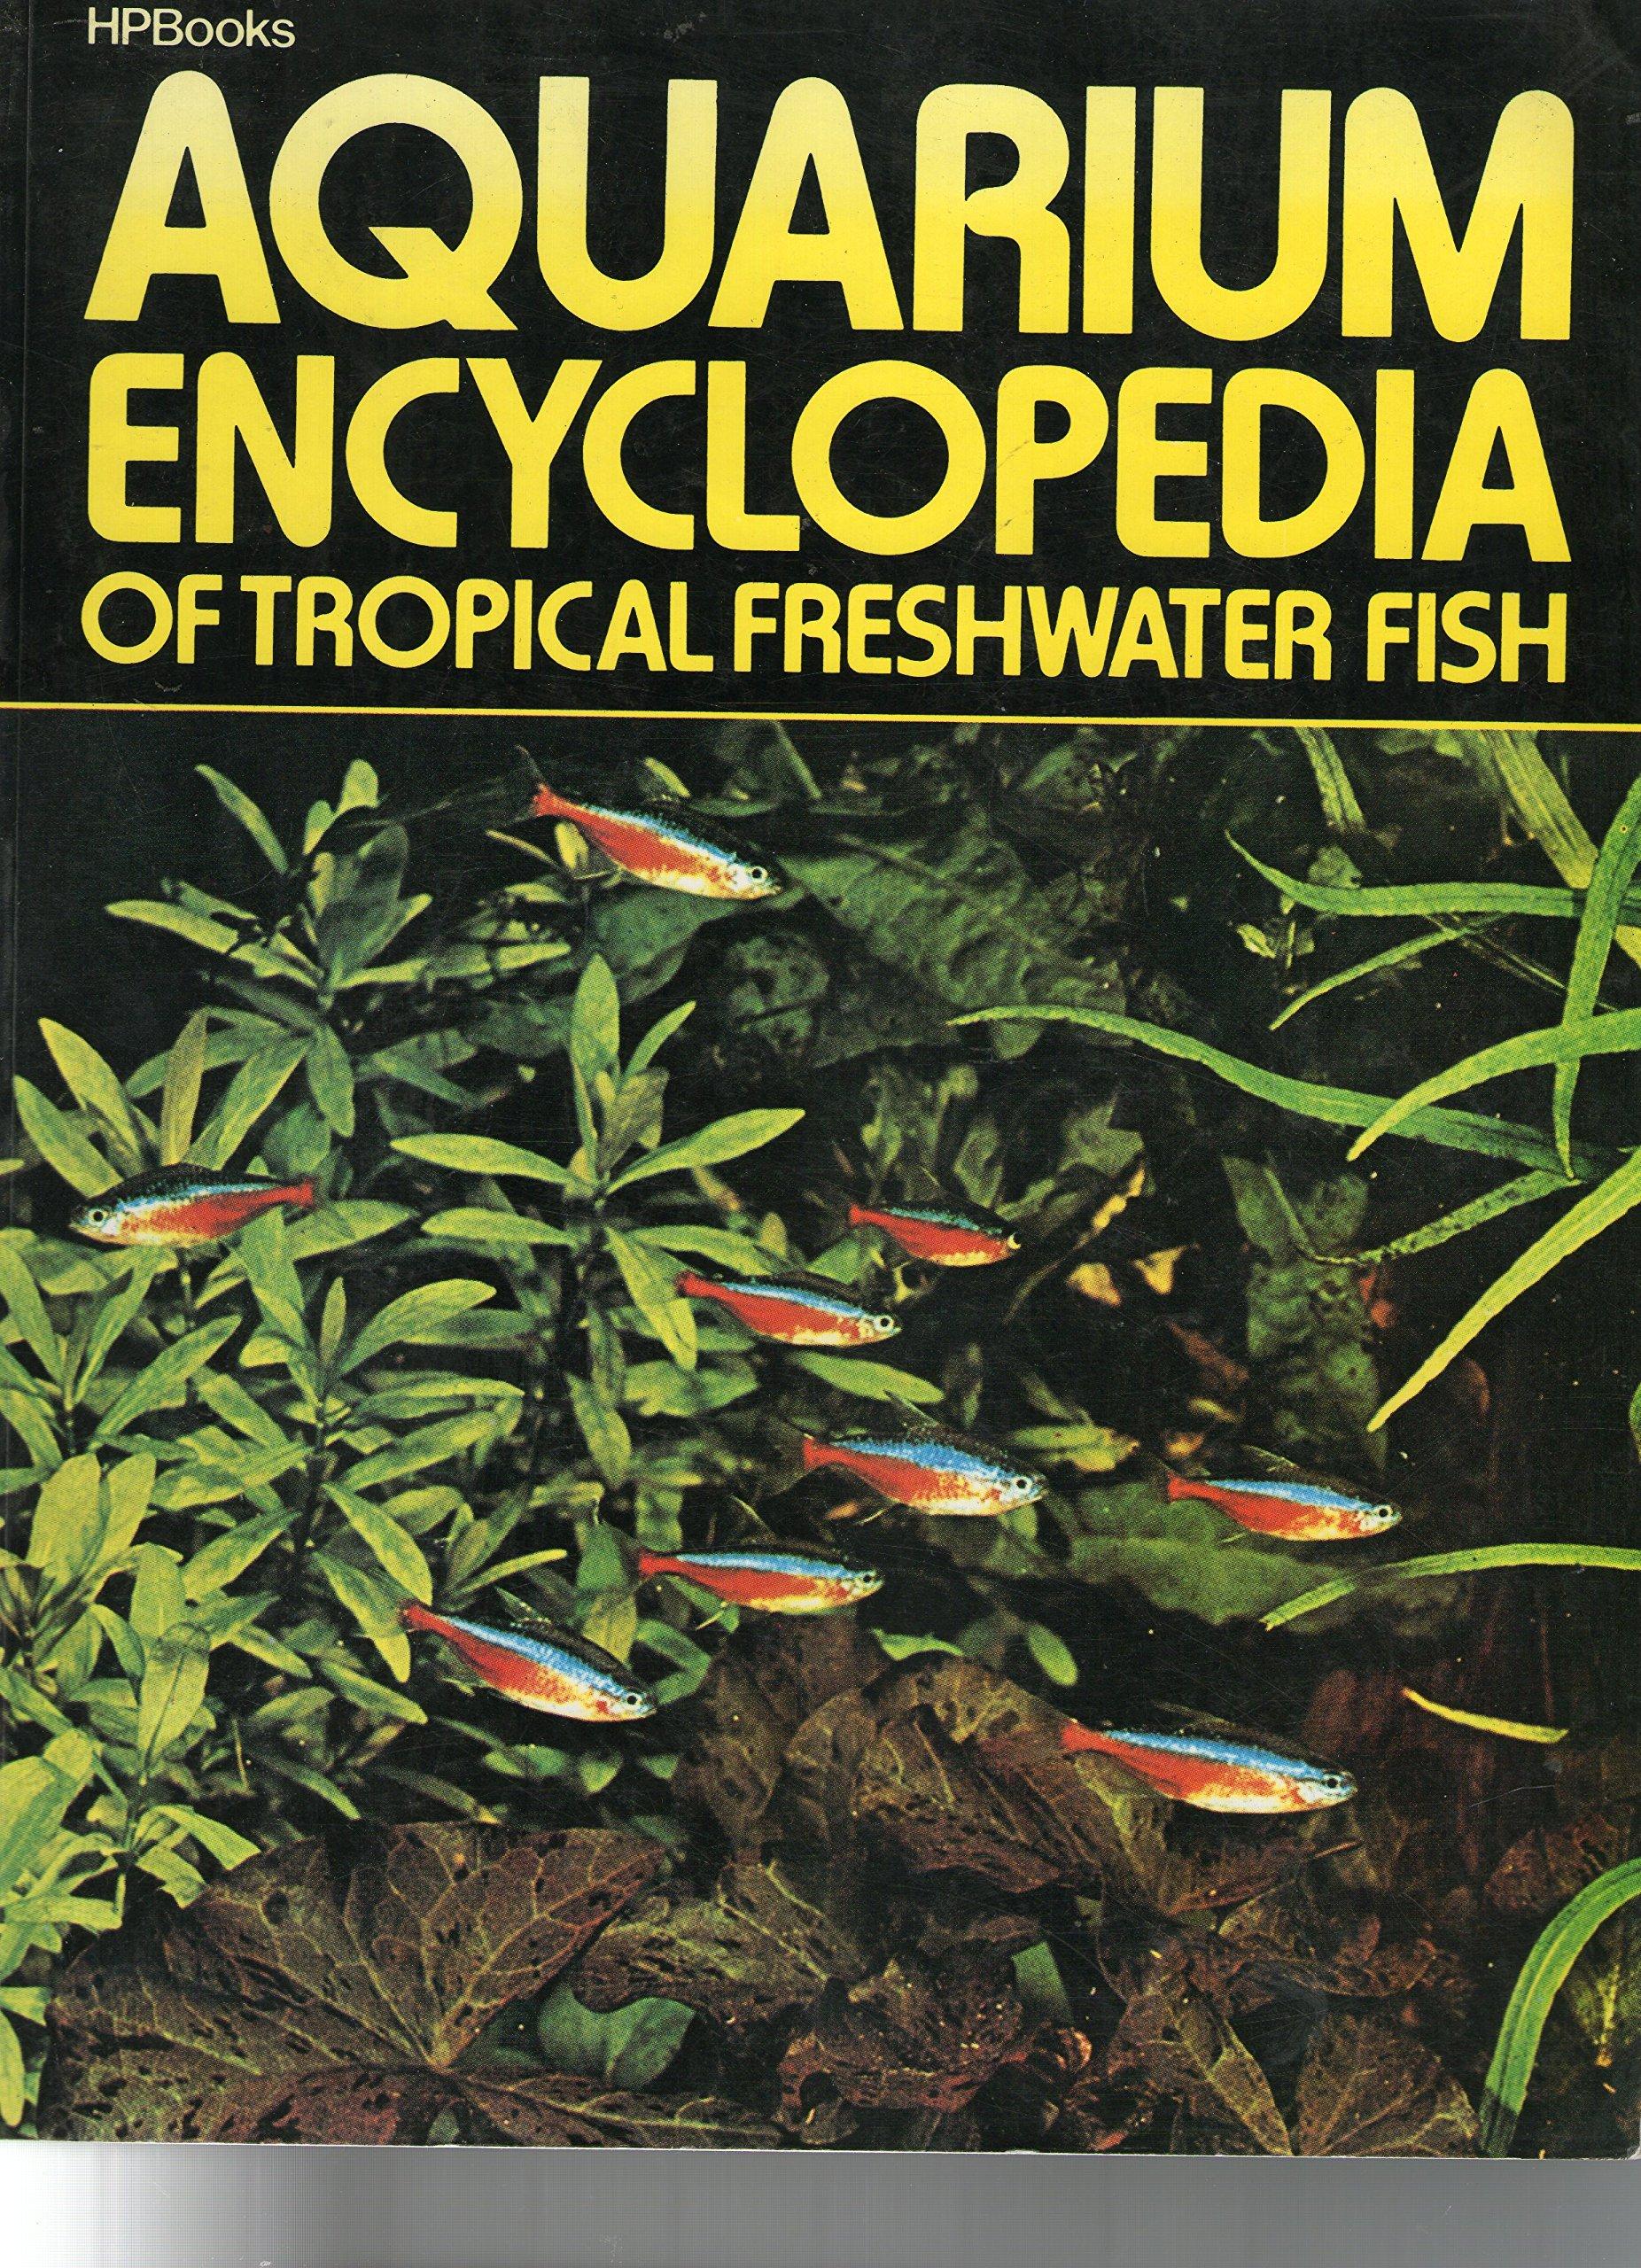 Freshwater aquarium fish ebook free download - Aquarium Encyclopedia Of Tropical Freshwater Fish J D Van Ramshorst A Van Den Nieuwenhuizen 9780895862969 Amazon Com Books